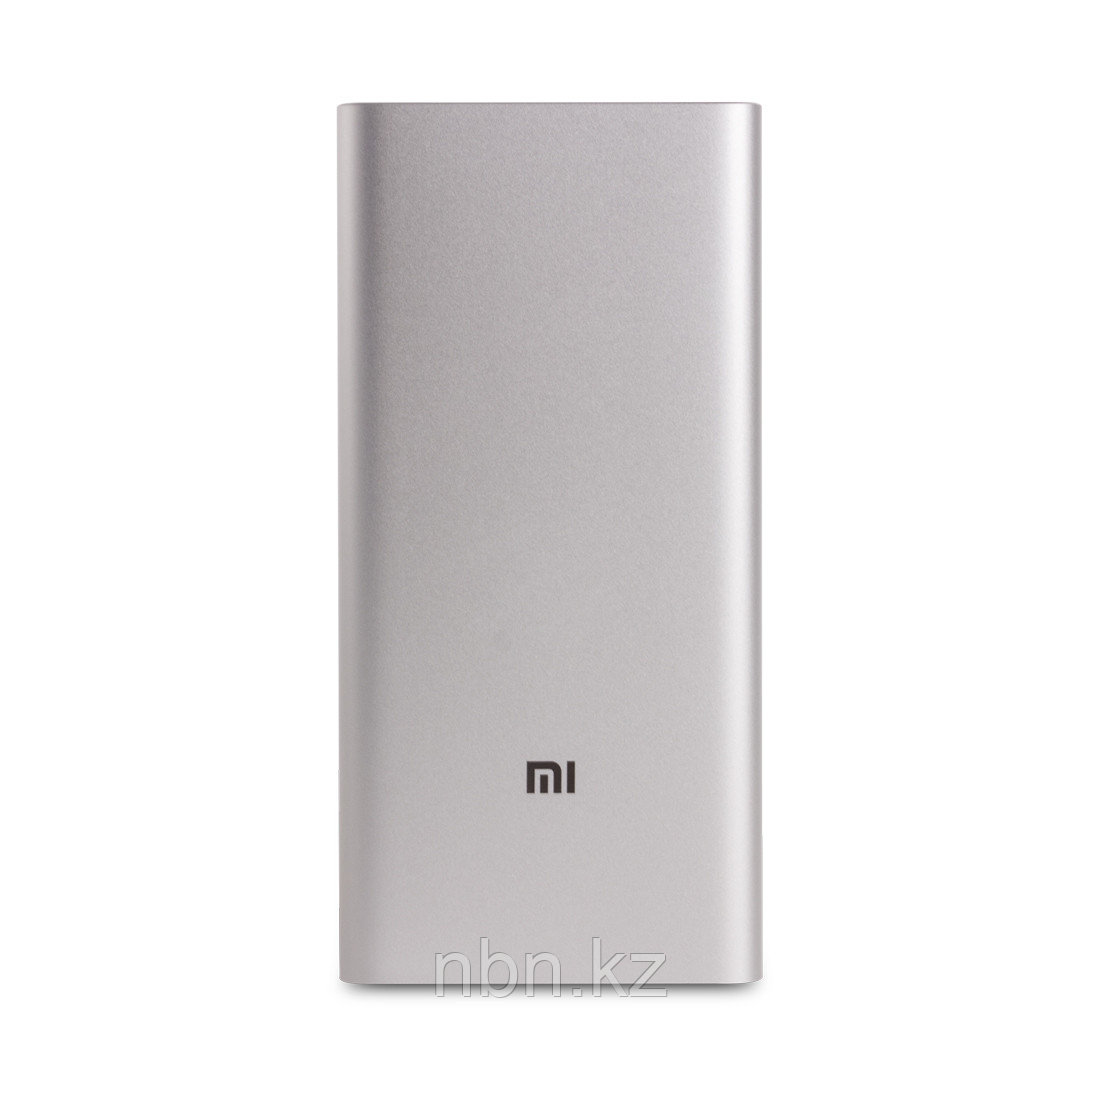 Портативное зарядное устройство Xiaomi Mi Power Bank 10000mAh 3 (2019 Type-C) (PLM12ZM) Серебристый